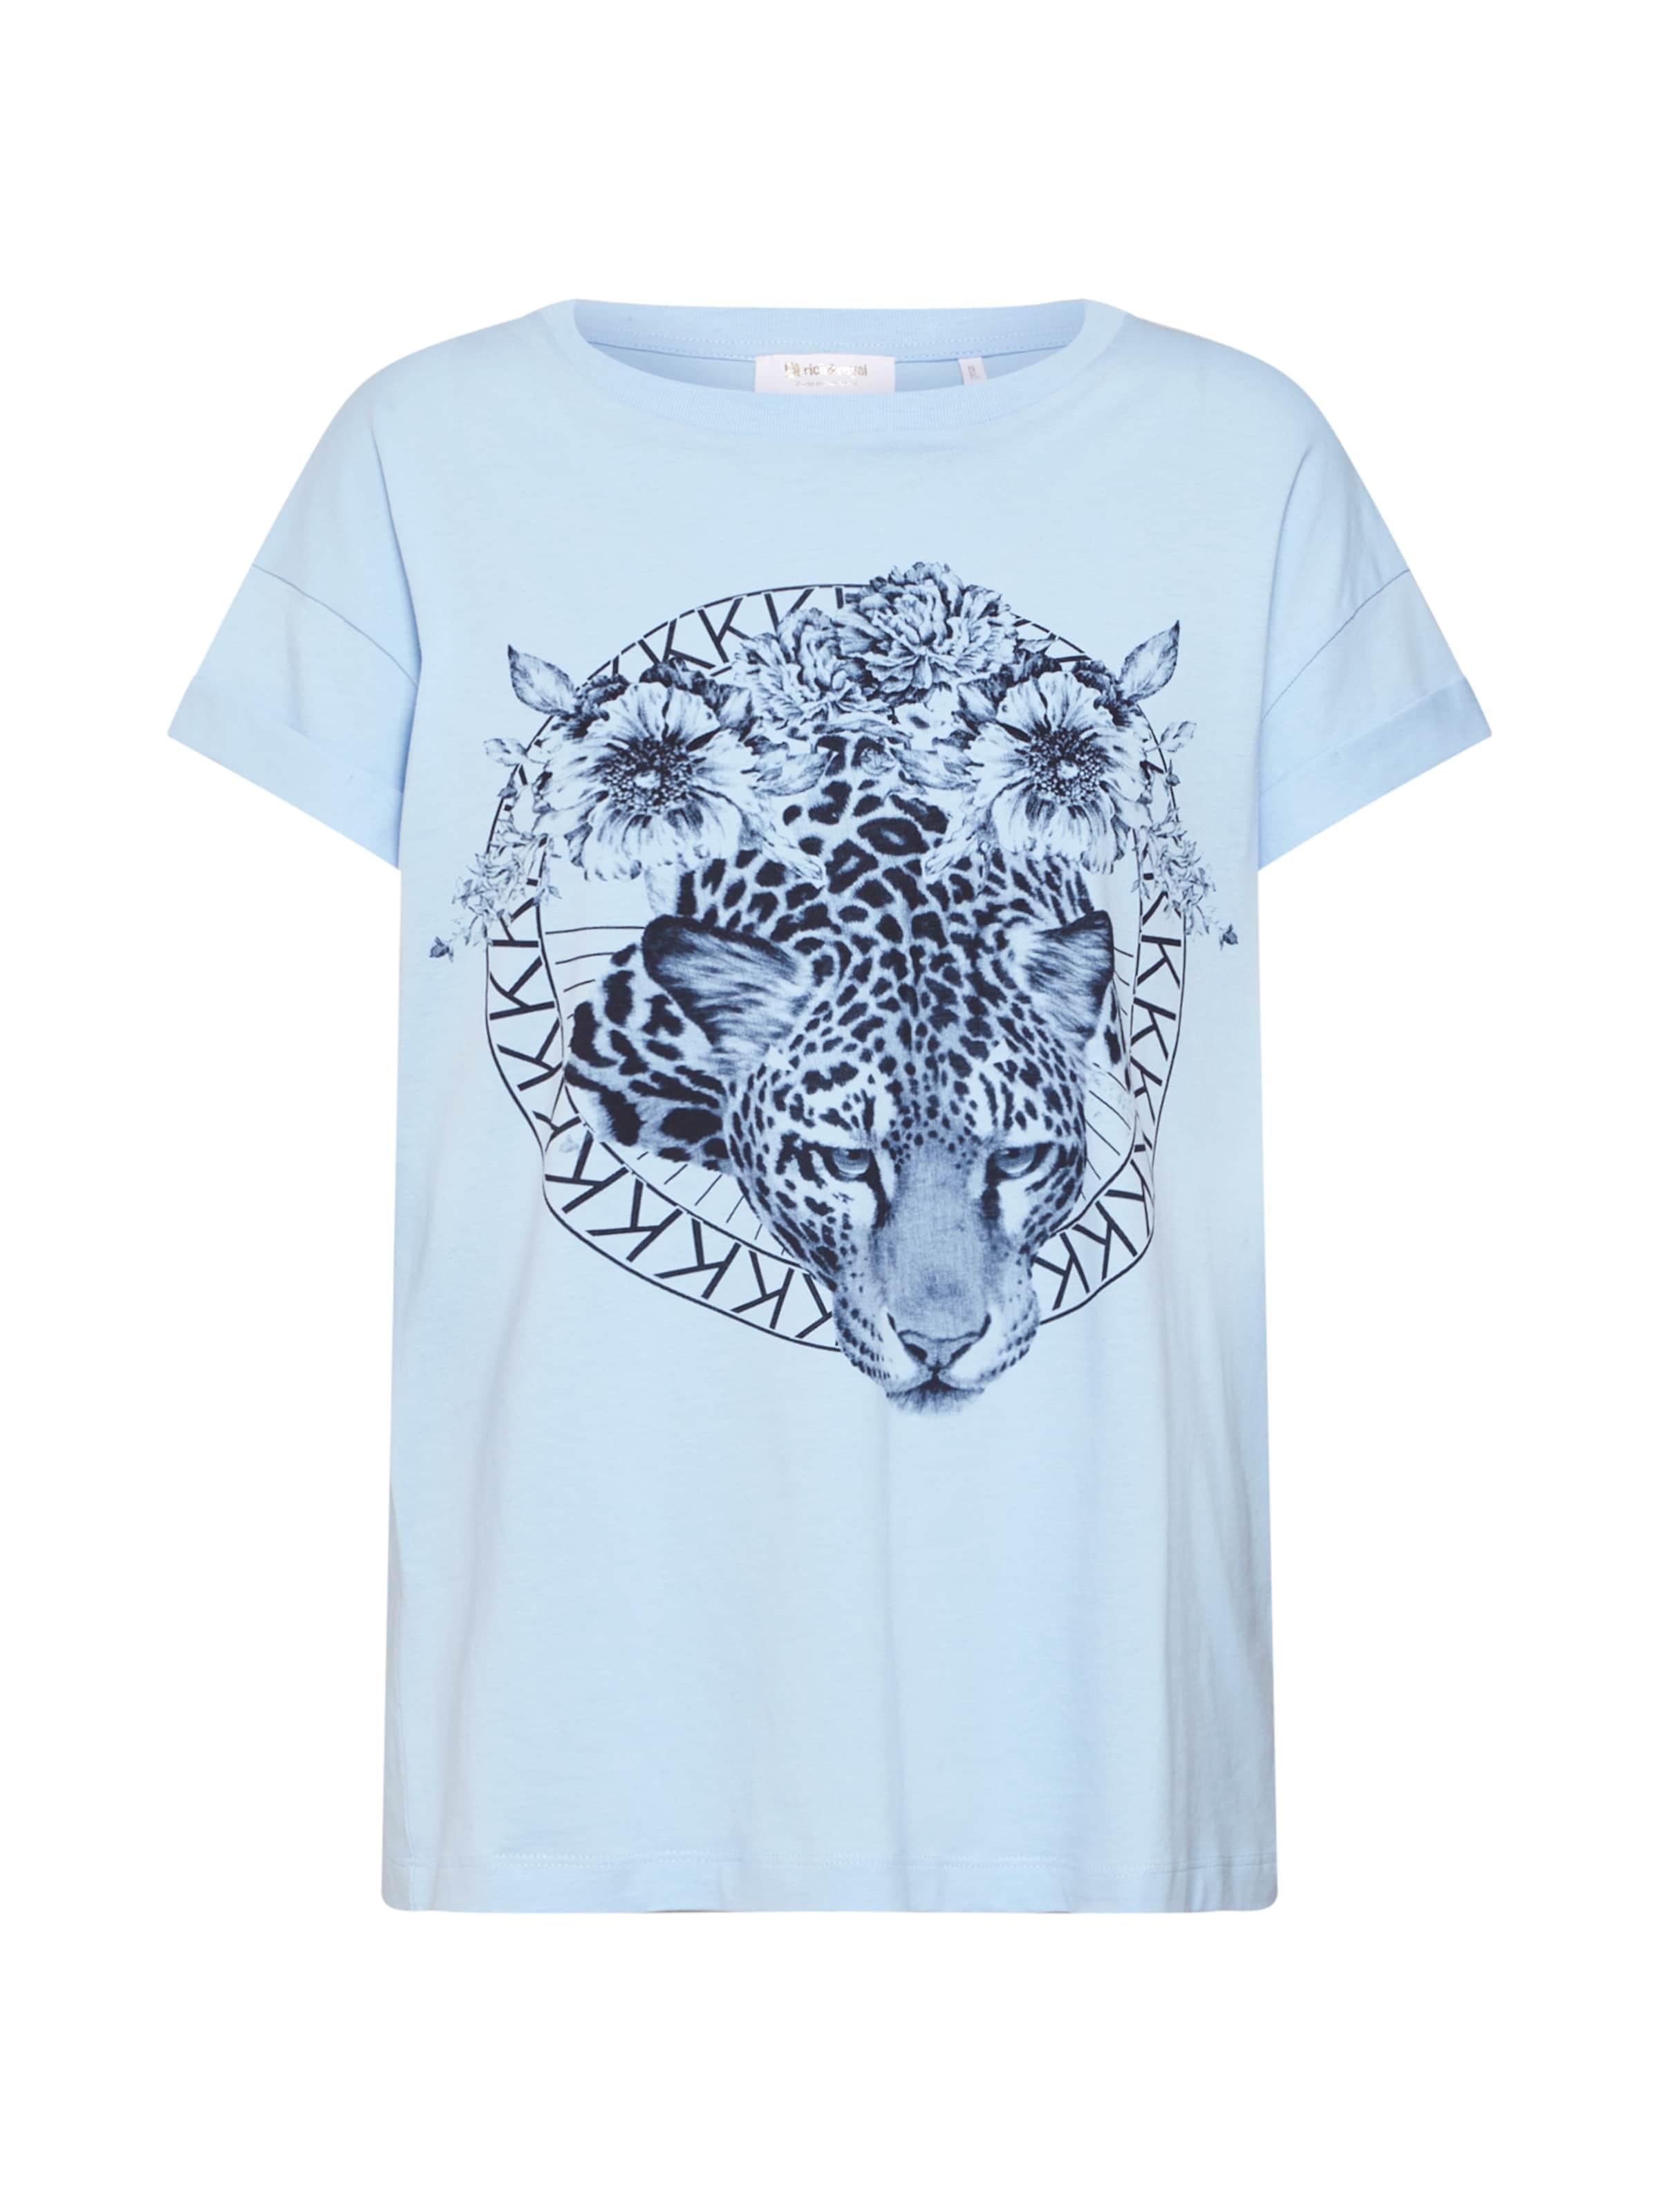 T shirt 'leo' Richamp; En Bleu FoncéBlanc Royal 2HIYeWEbD9